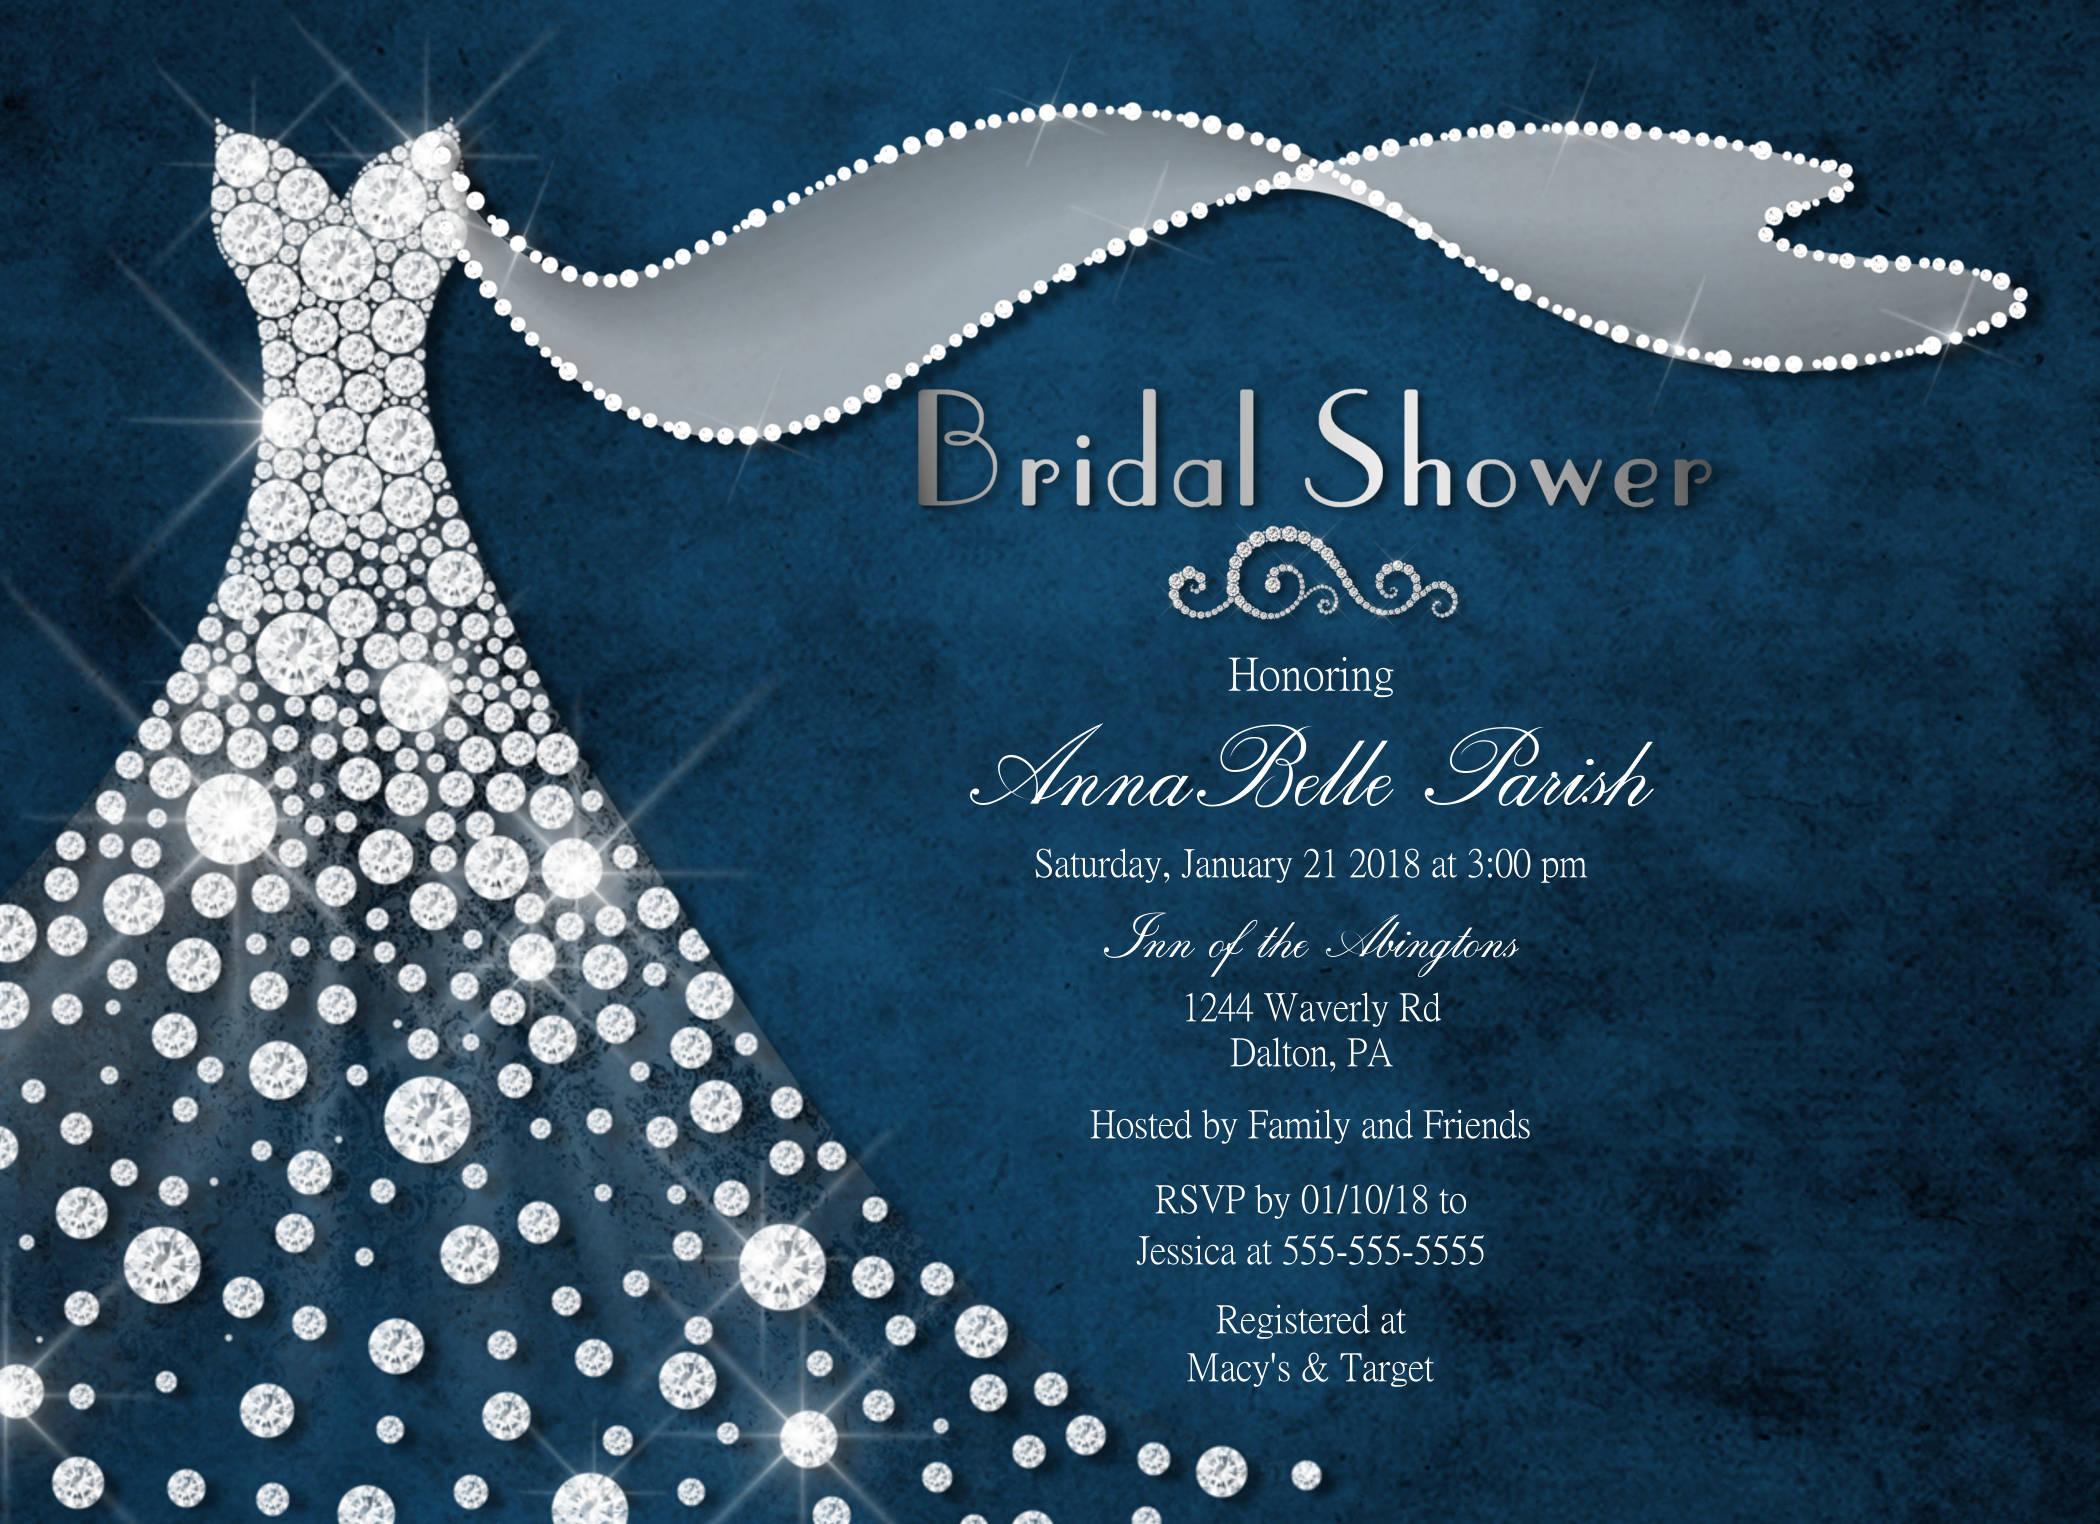 Blue and Silver Wedding Dress Bridal Shower invitations Dress – Wedding Dress Shower Invitations